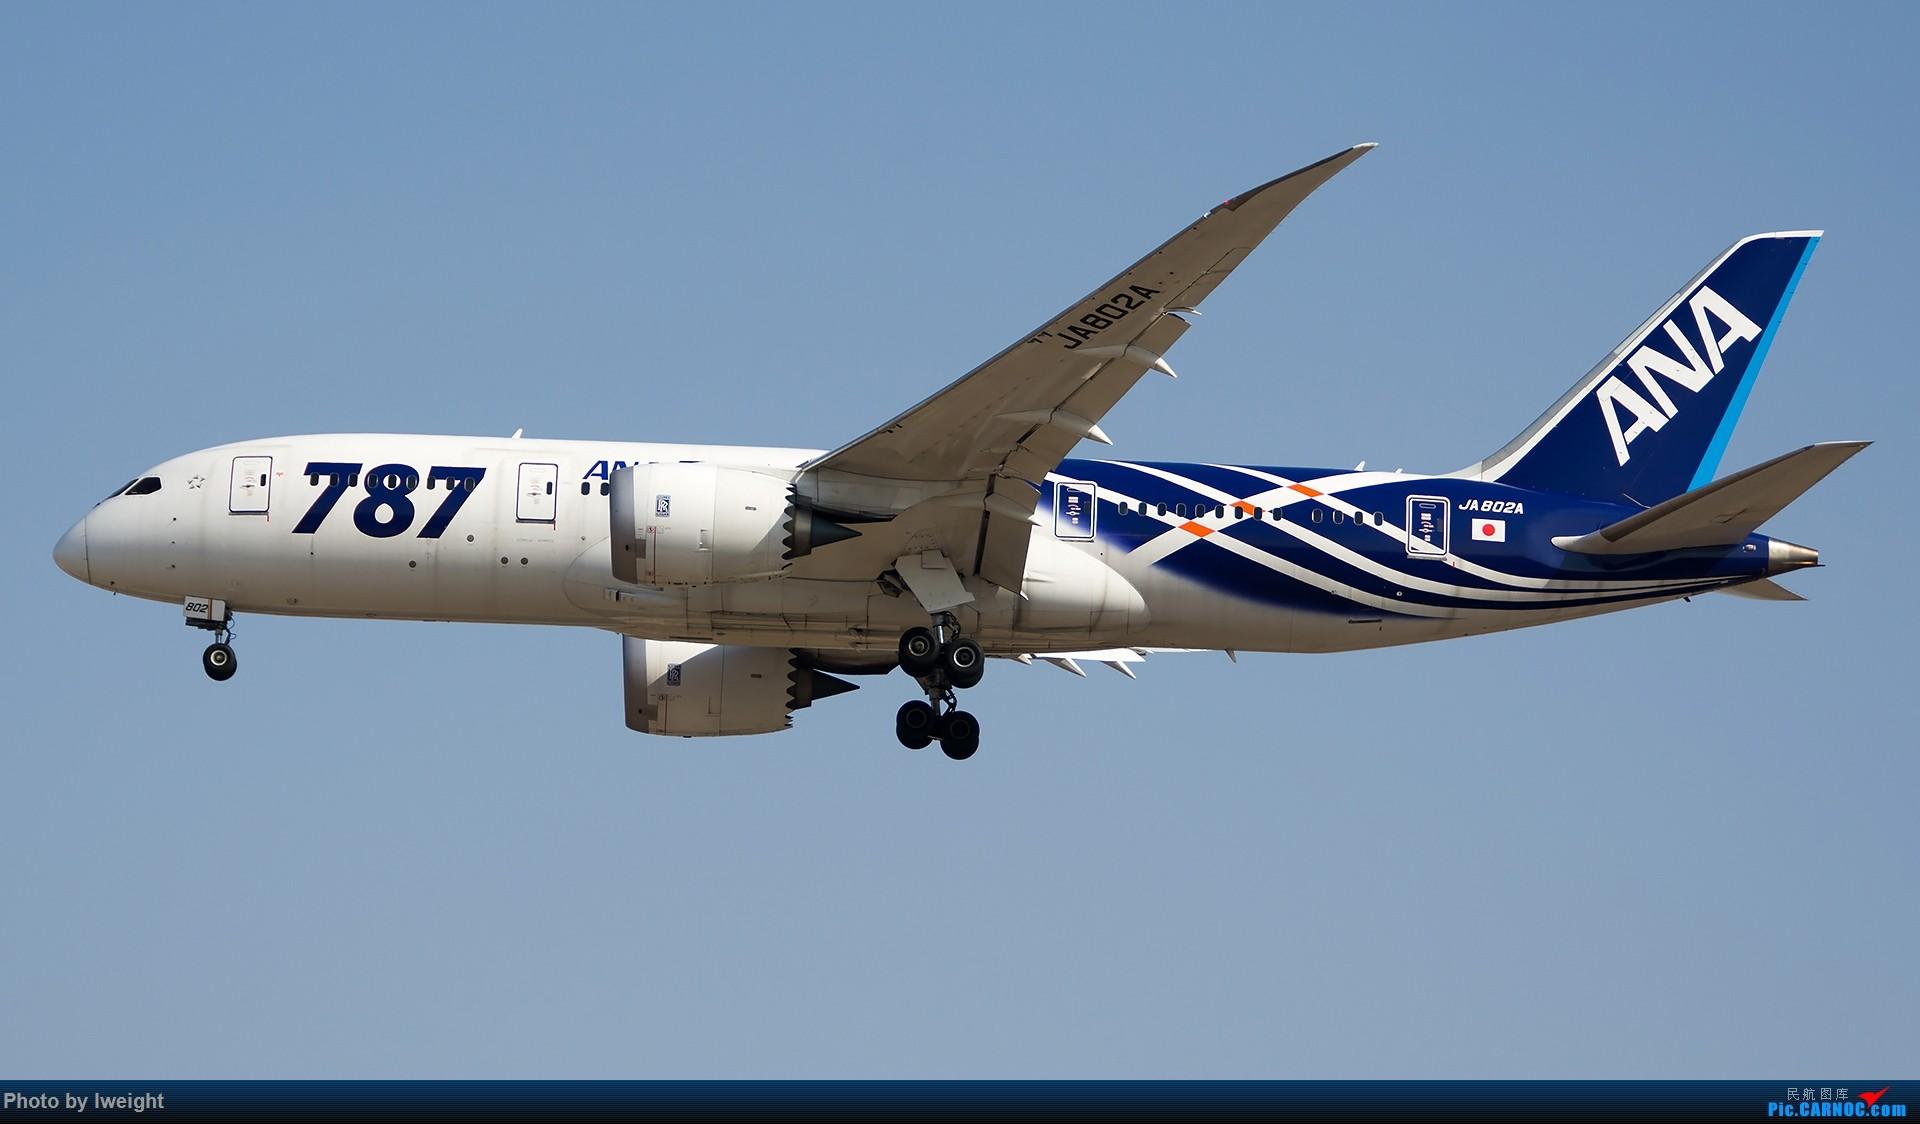 Re:[原创]羊年第一次拍机,首都机场[2015-2-23] BOEING 787-8 JA802A 中国北京首都国际机场